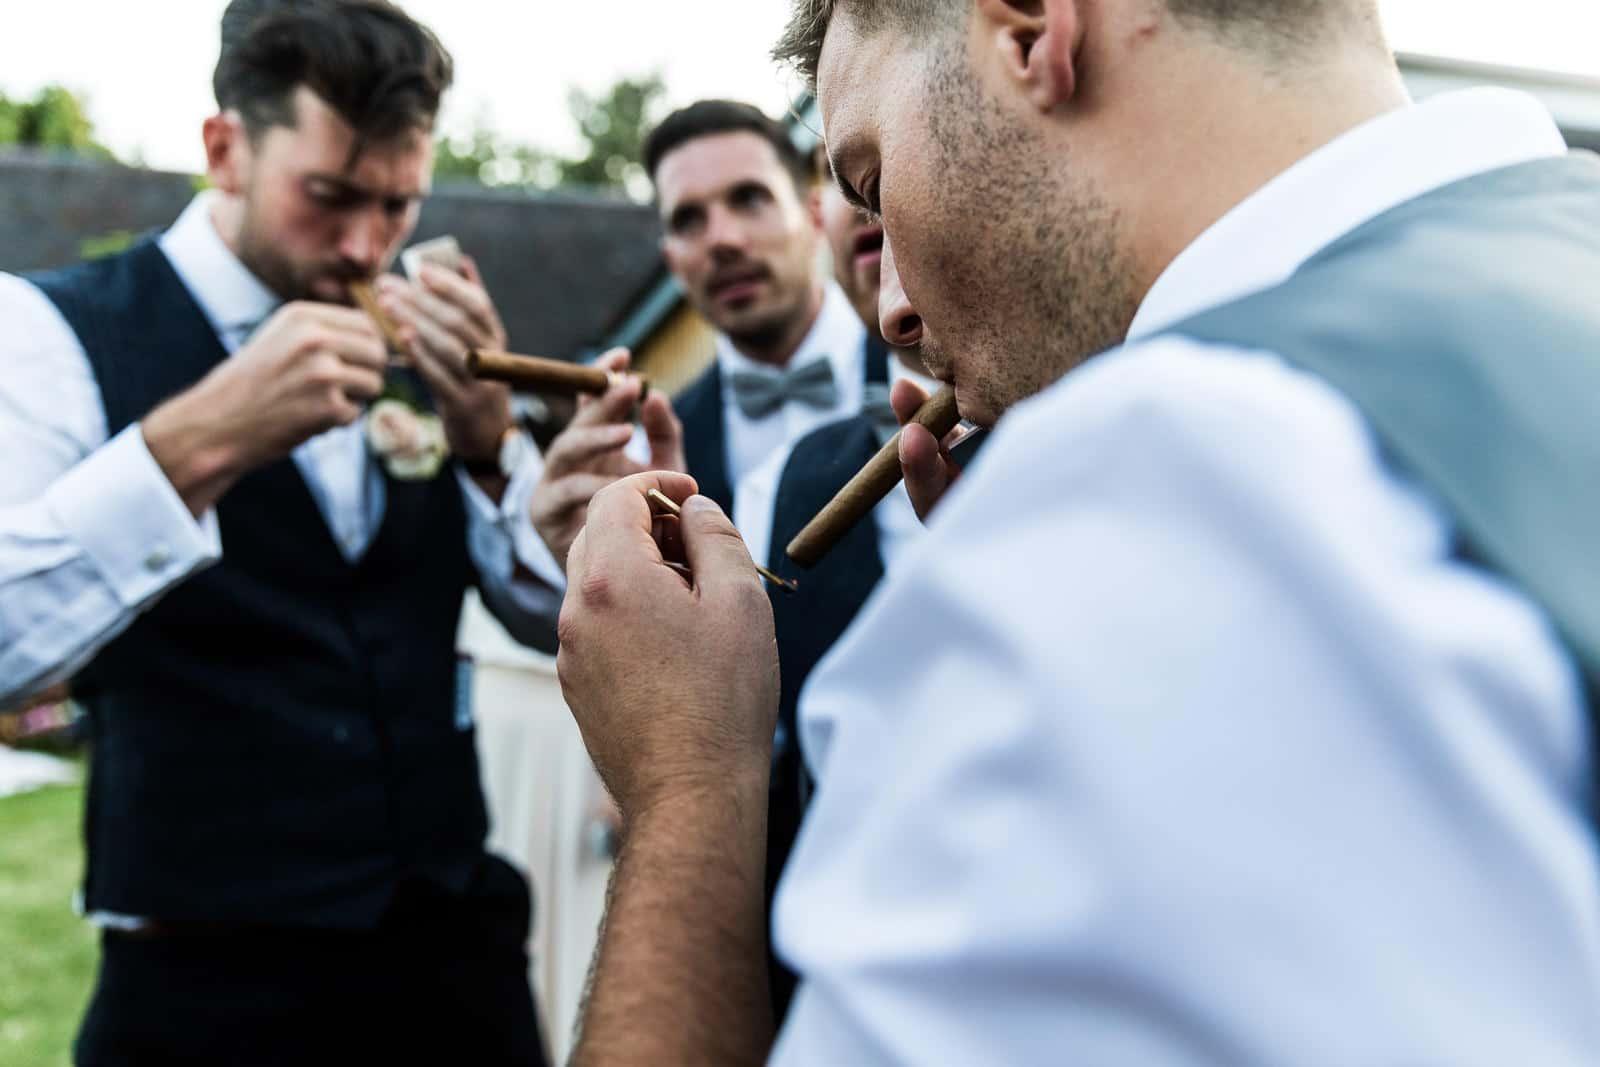 Groomsmen lighting cigars at a wedding at swallows nest barn